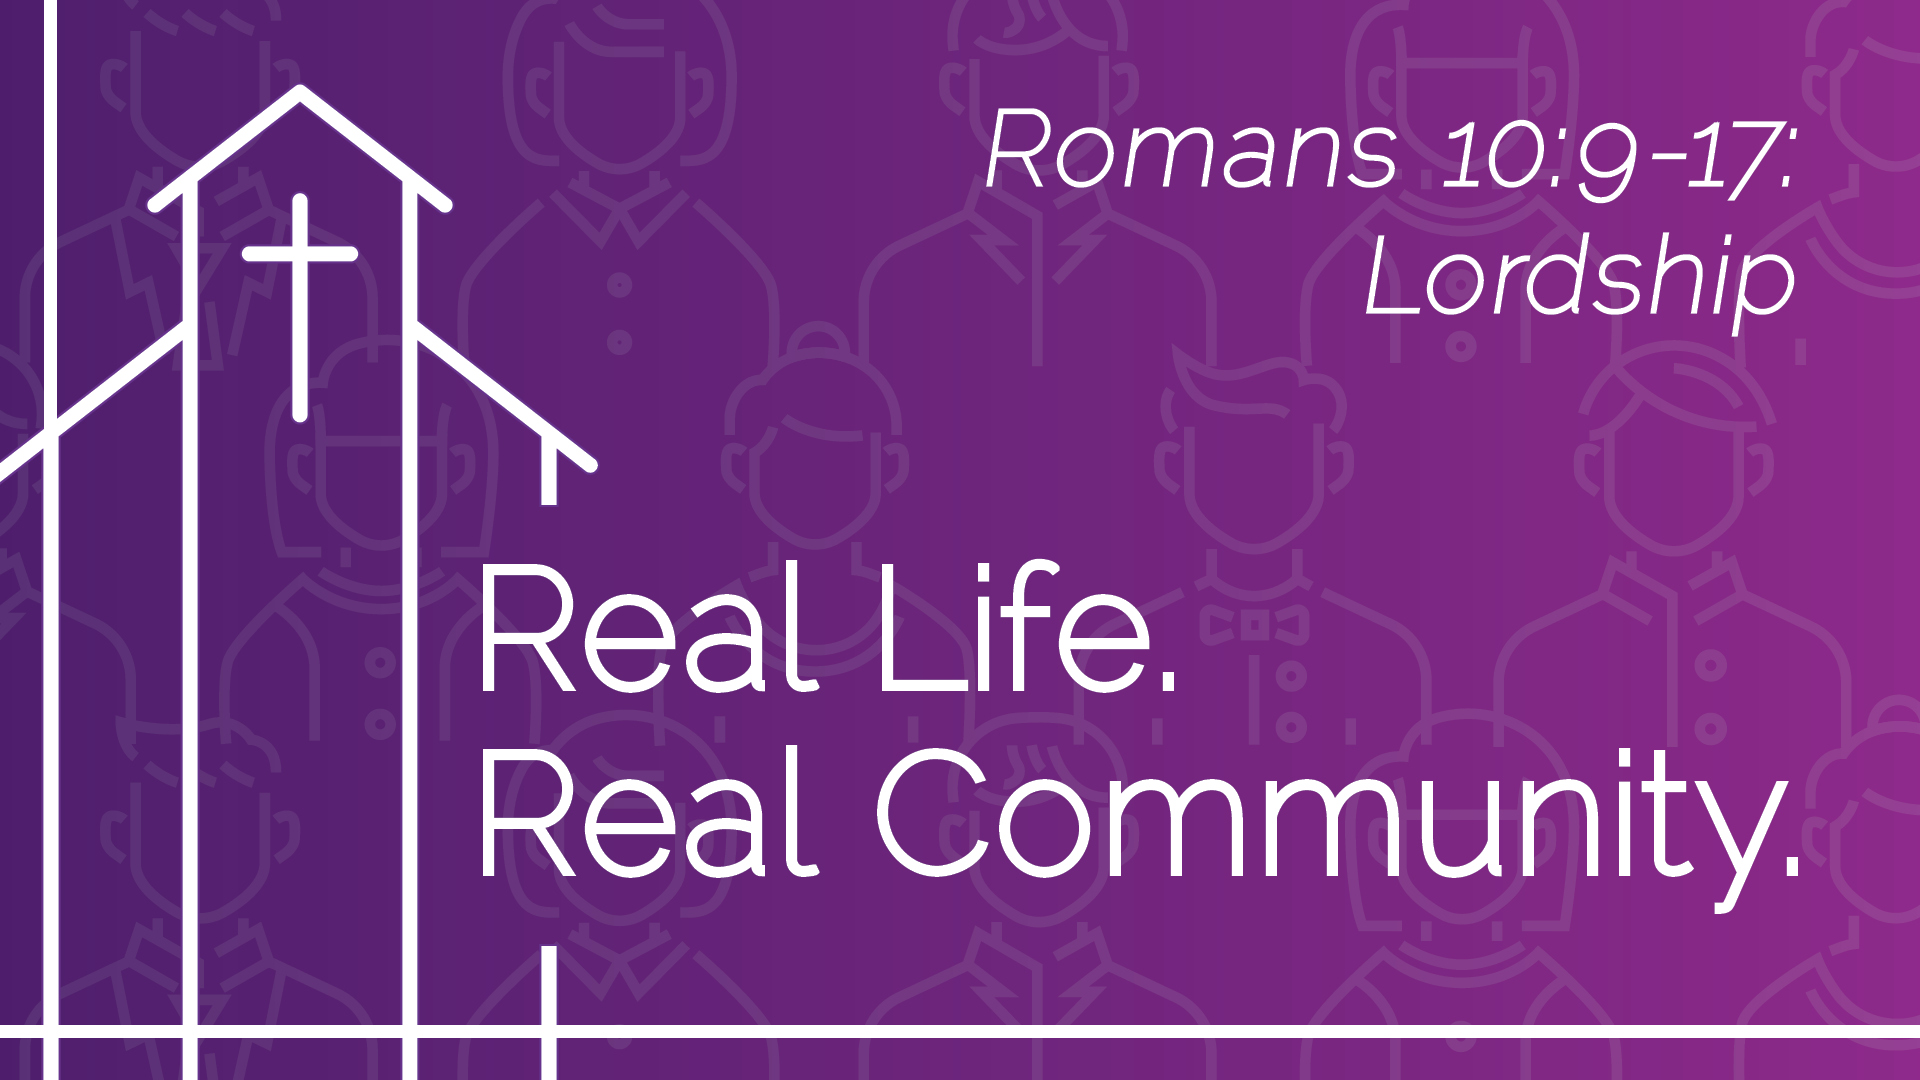 Real Community FEB28